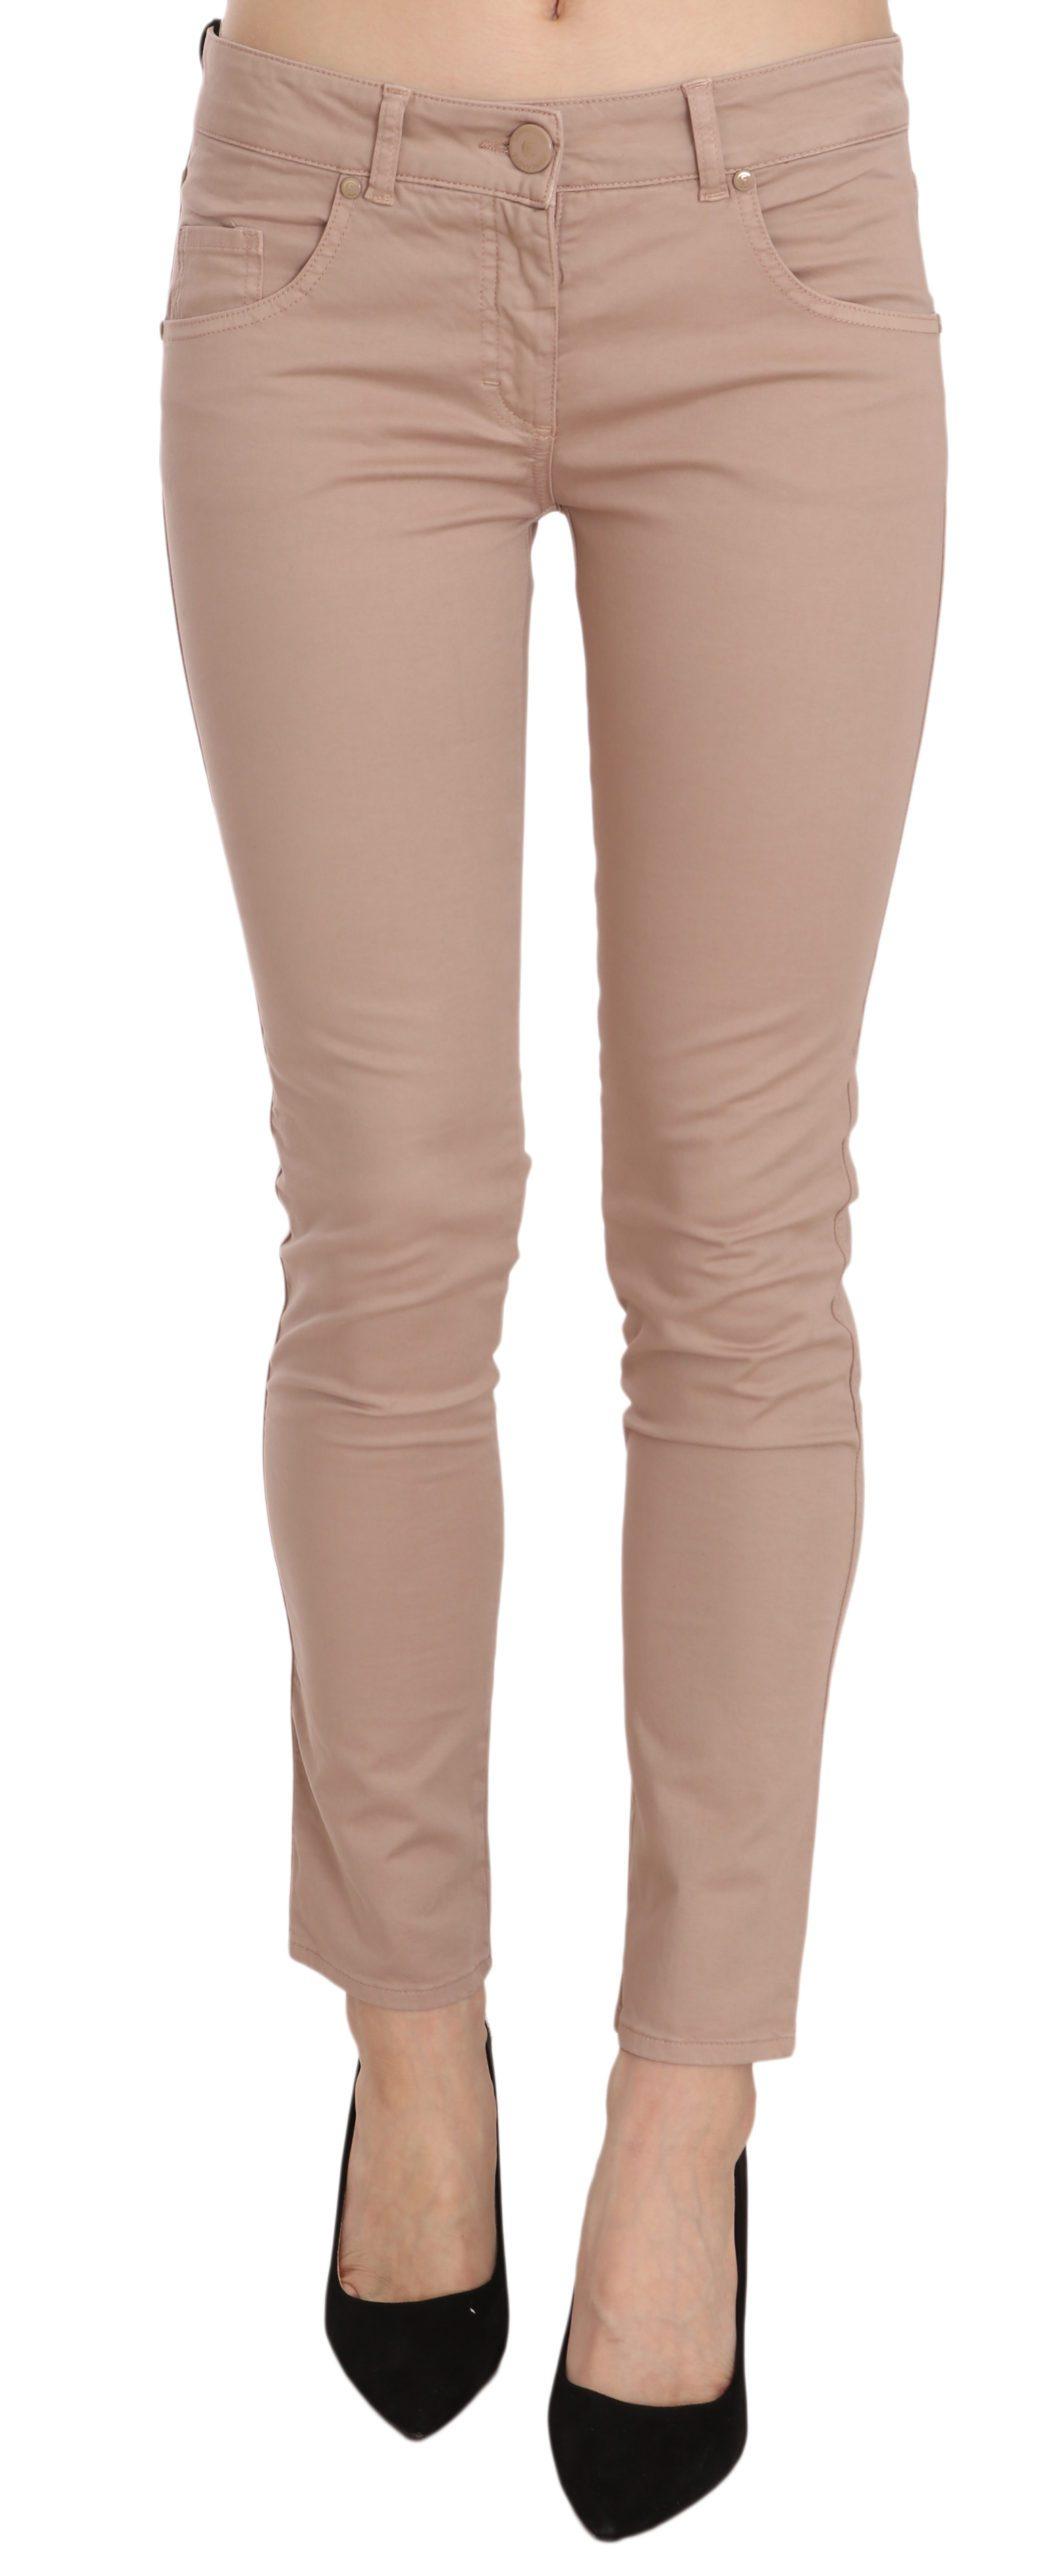 CRISTINAEFFE Women's Low Waist Slim Fit Skinny Cotton Trouser Brown PAN70184 - IT42|M